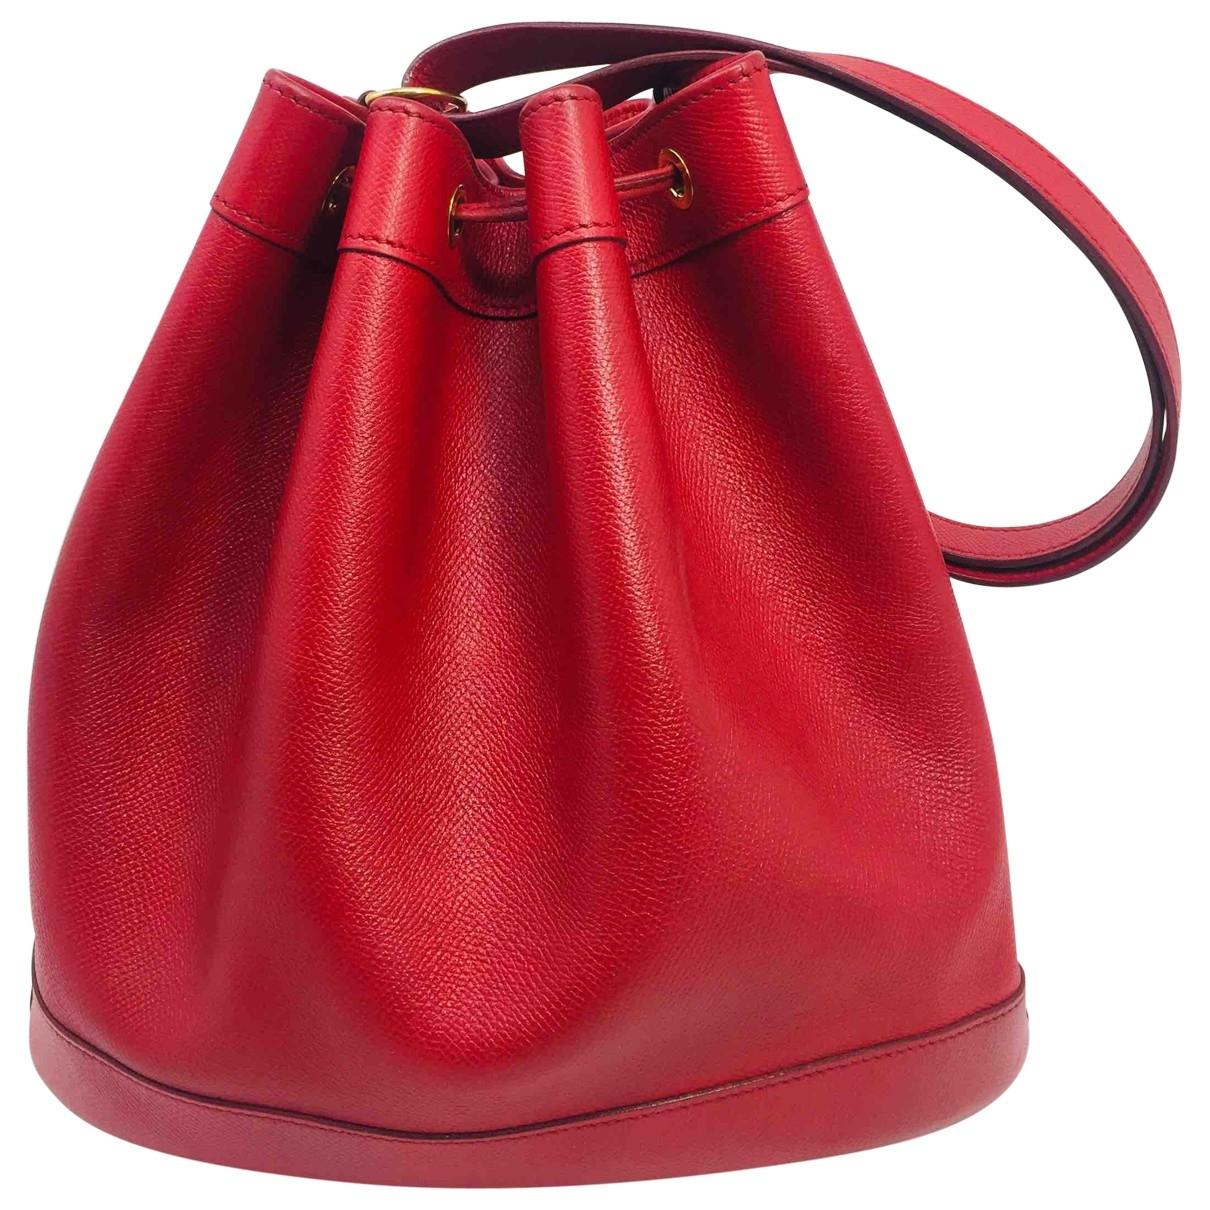 Hermes Market Handtasche in  Rot Leder